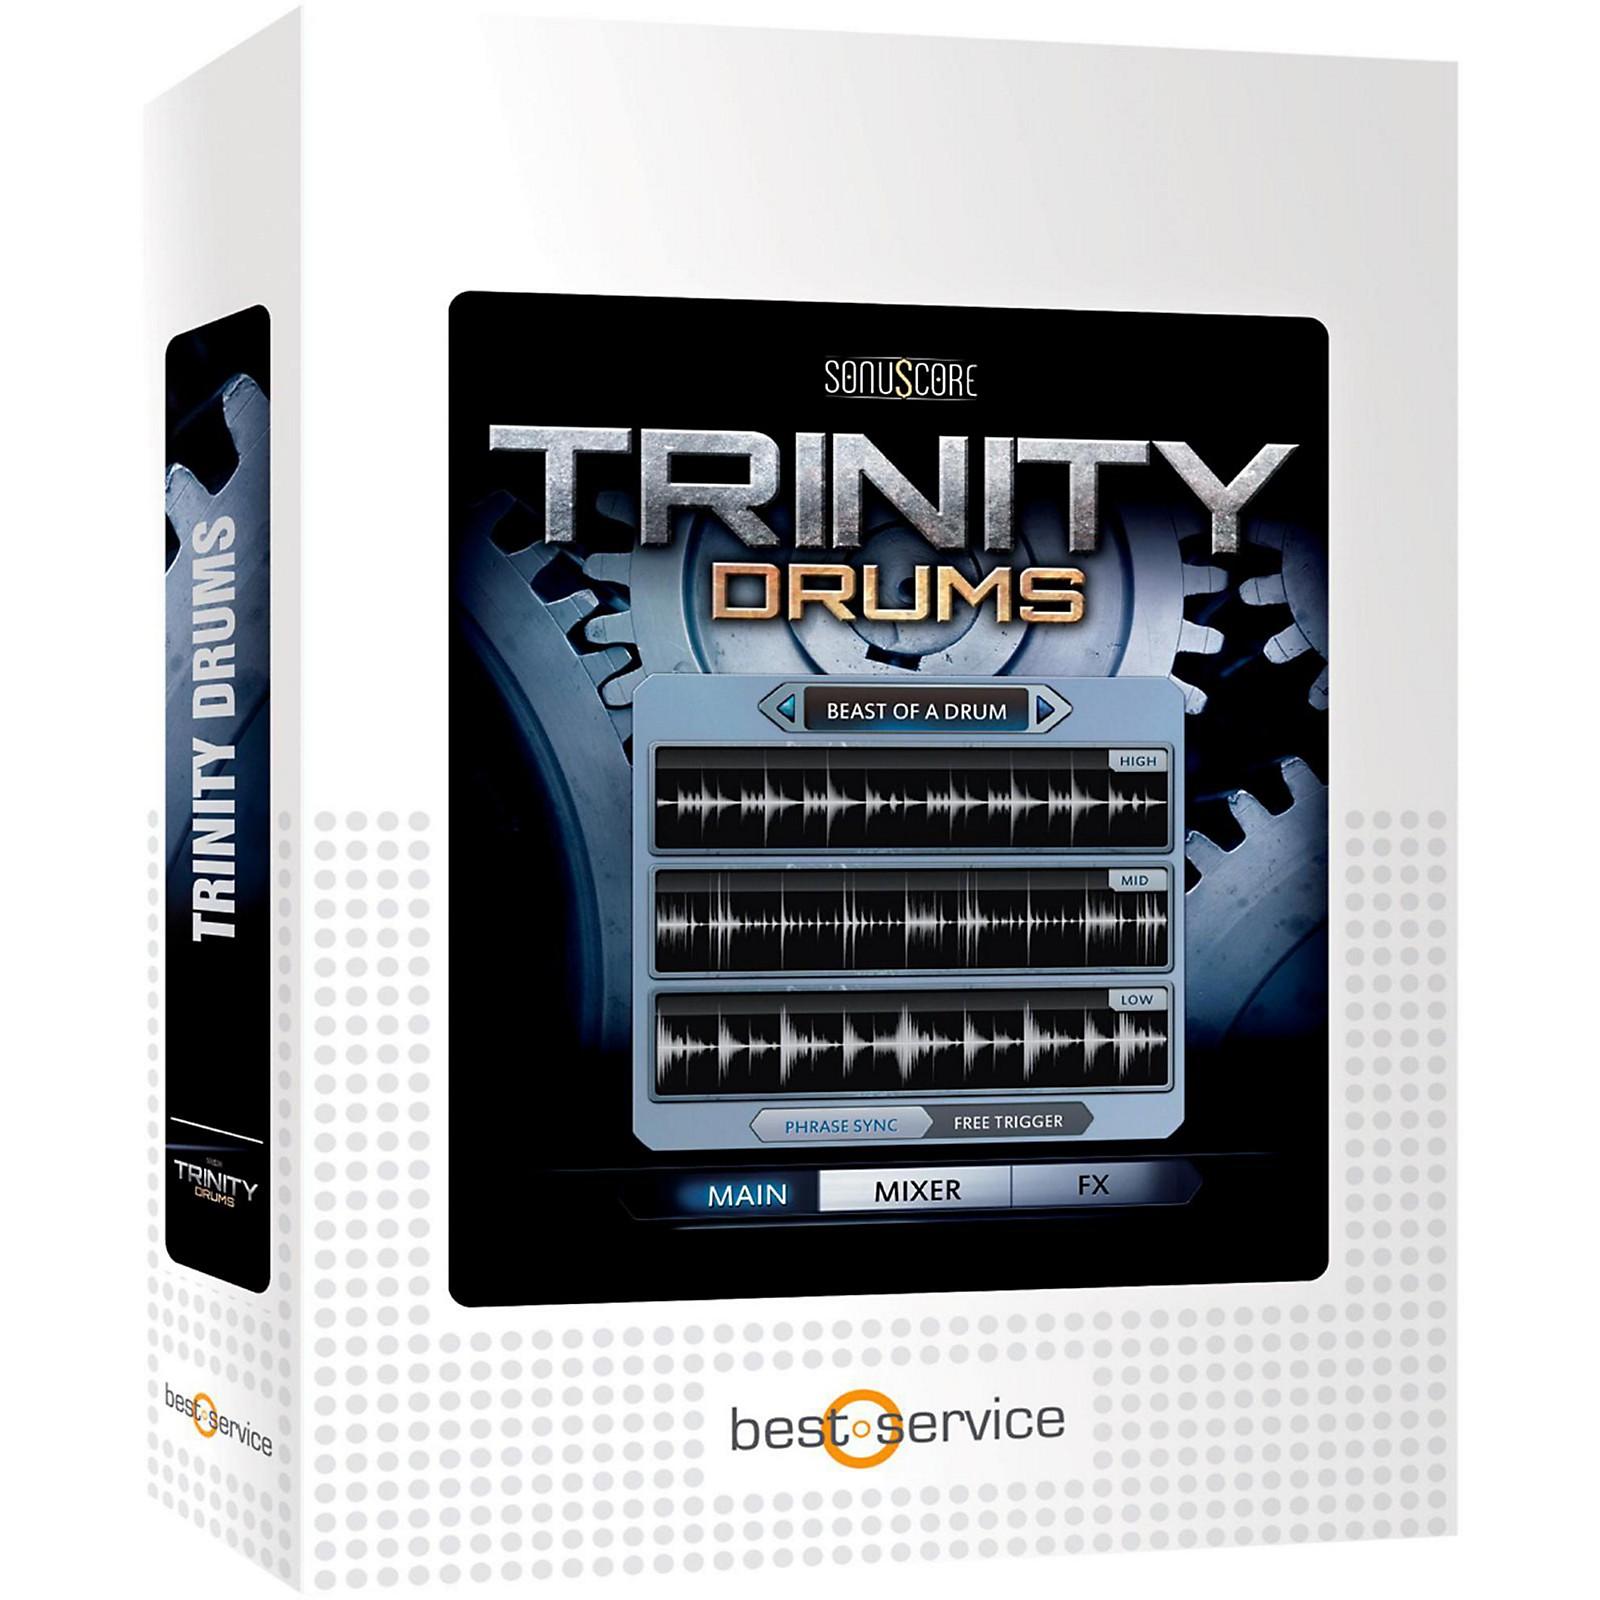 Sonuscore Trinity Drums